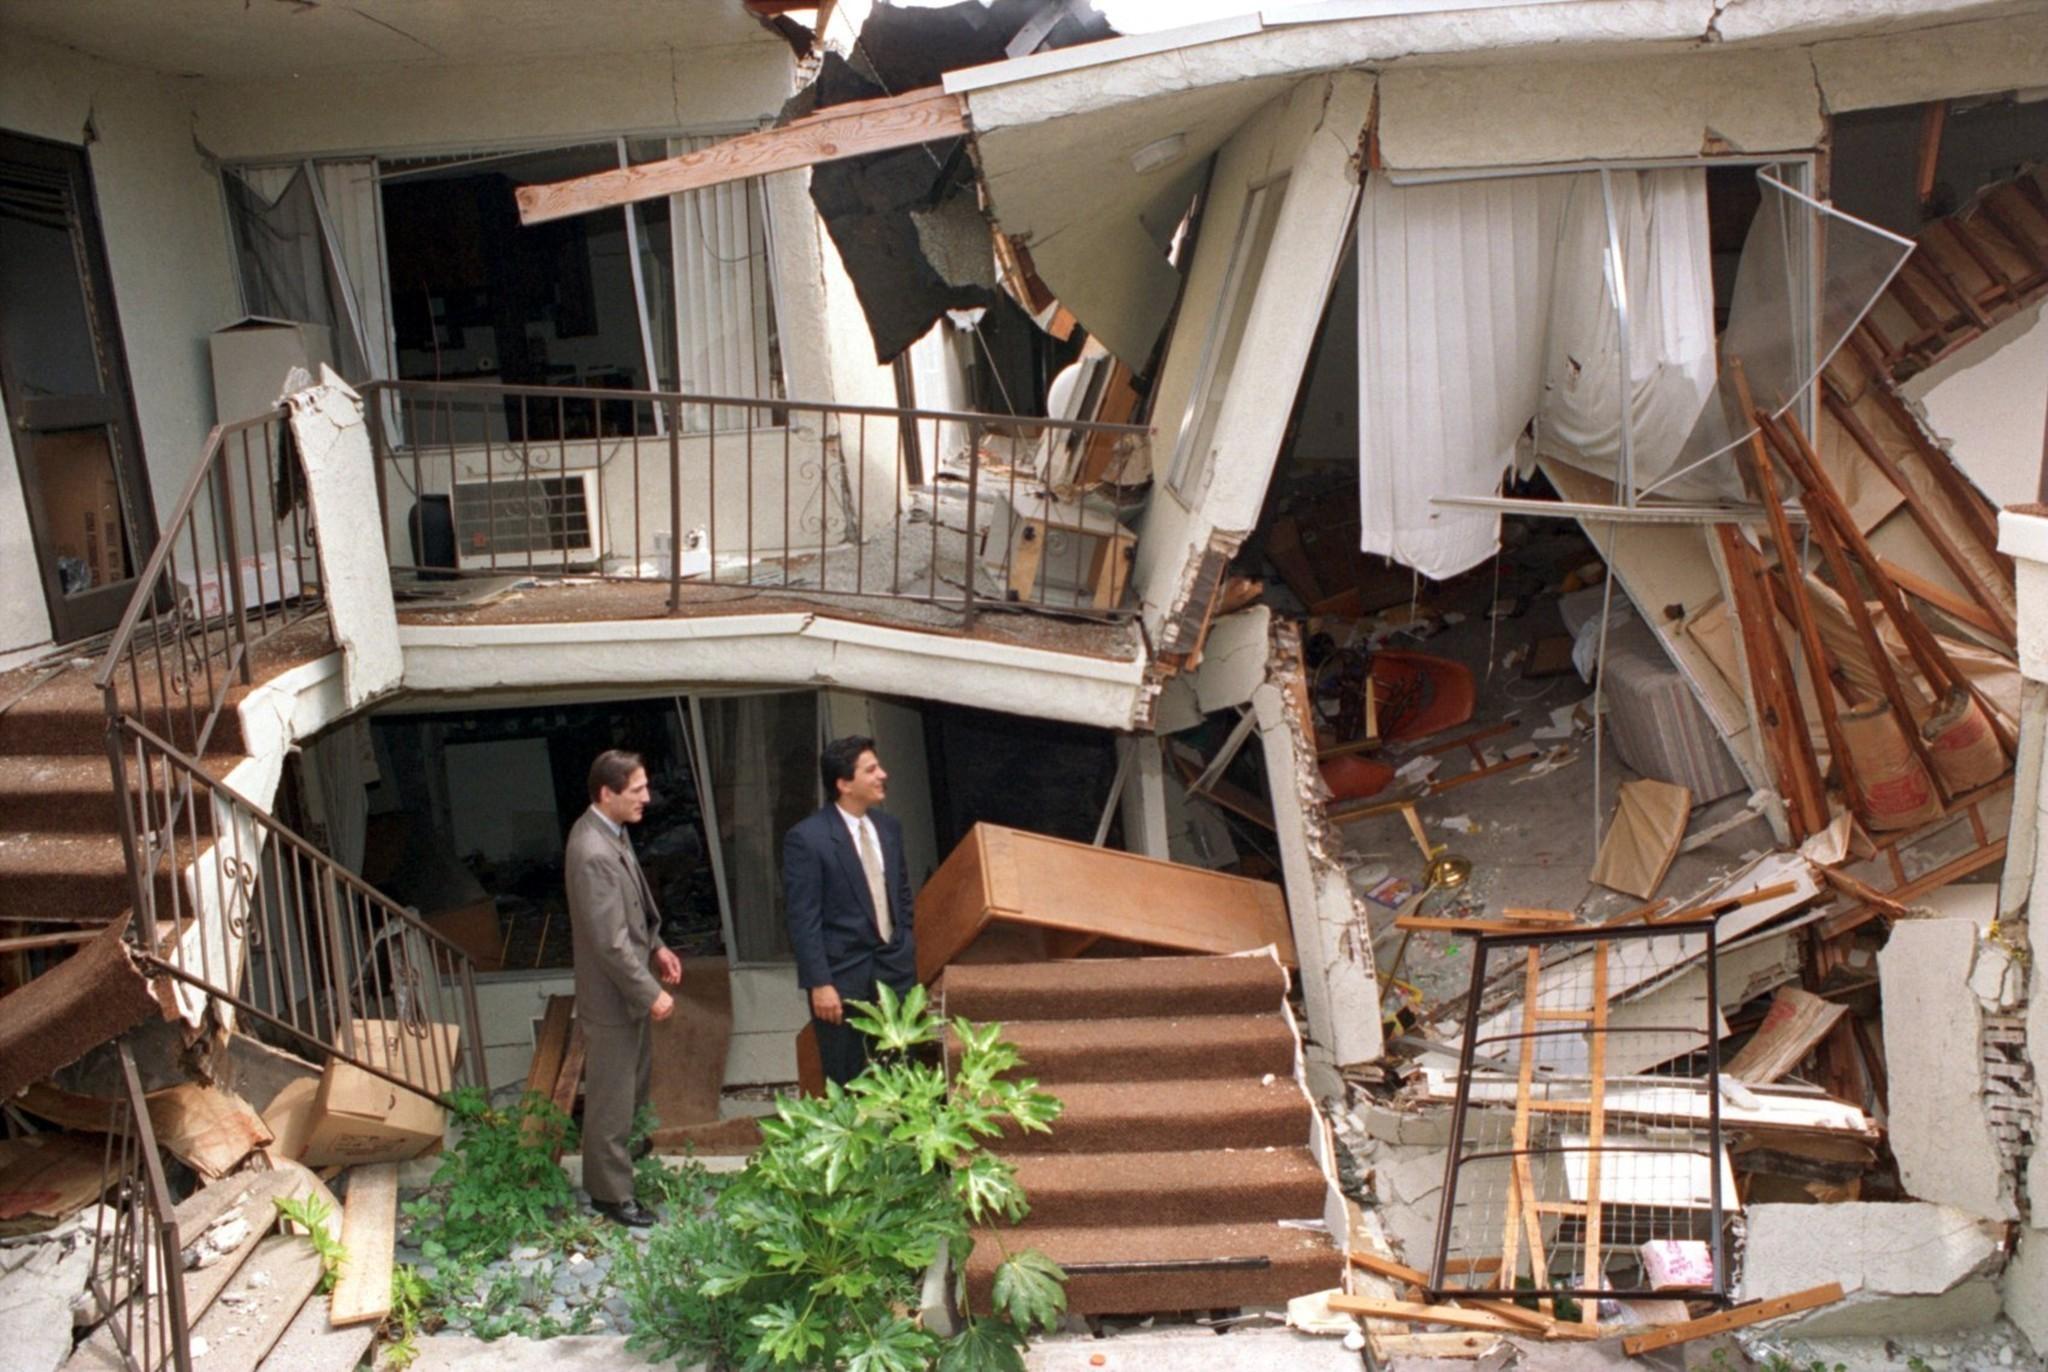 San Francisco Earthquake Retrofit Proposal Could Put Renters At Risk